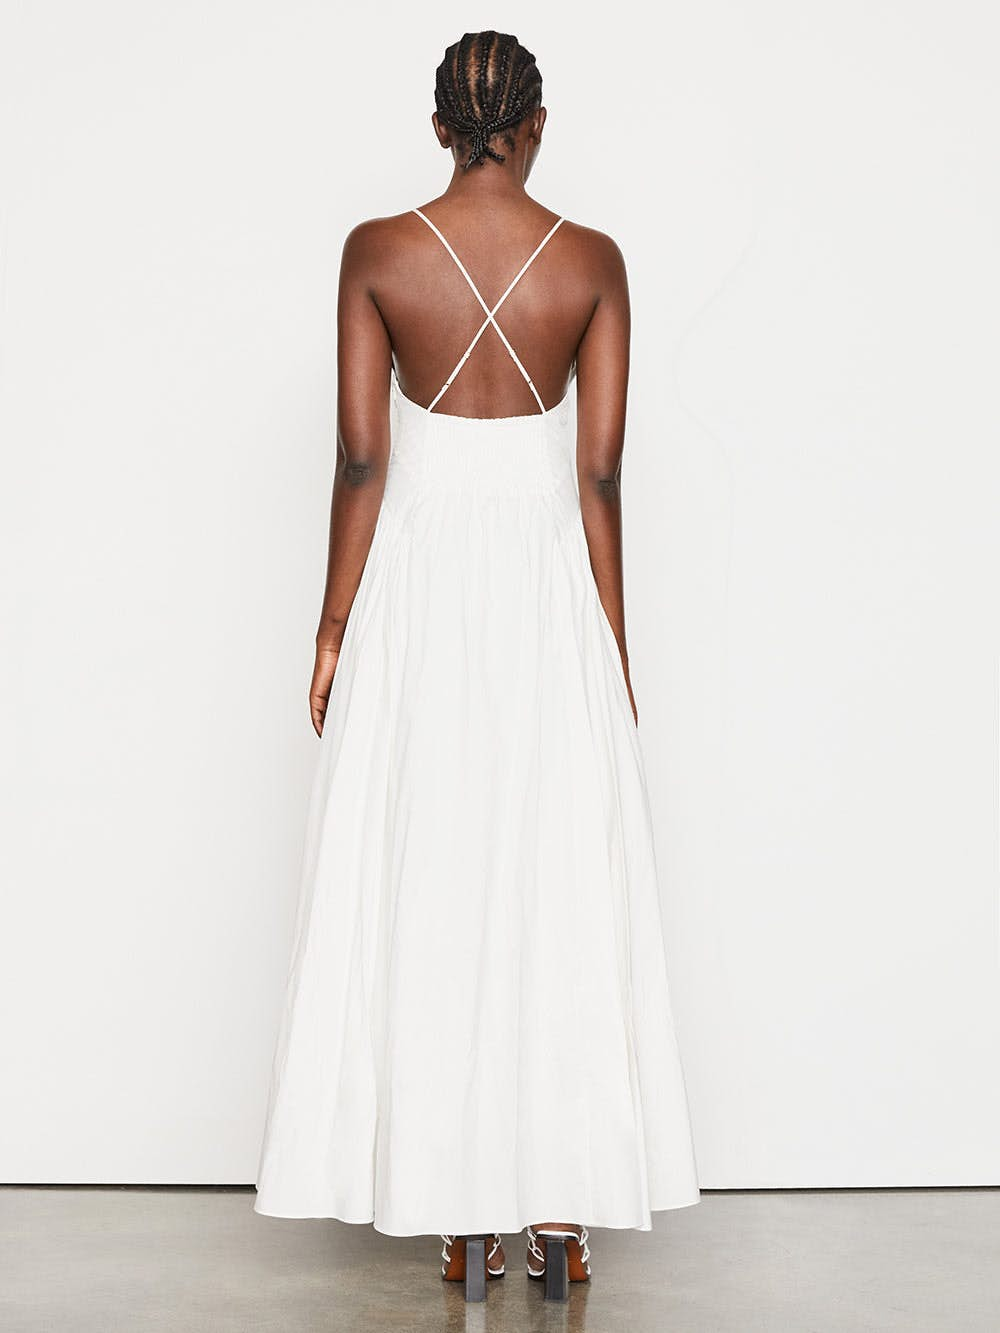 dress back view